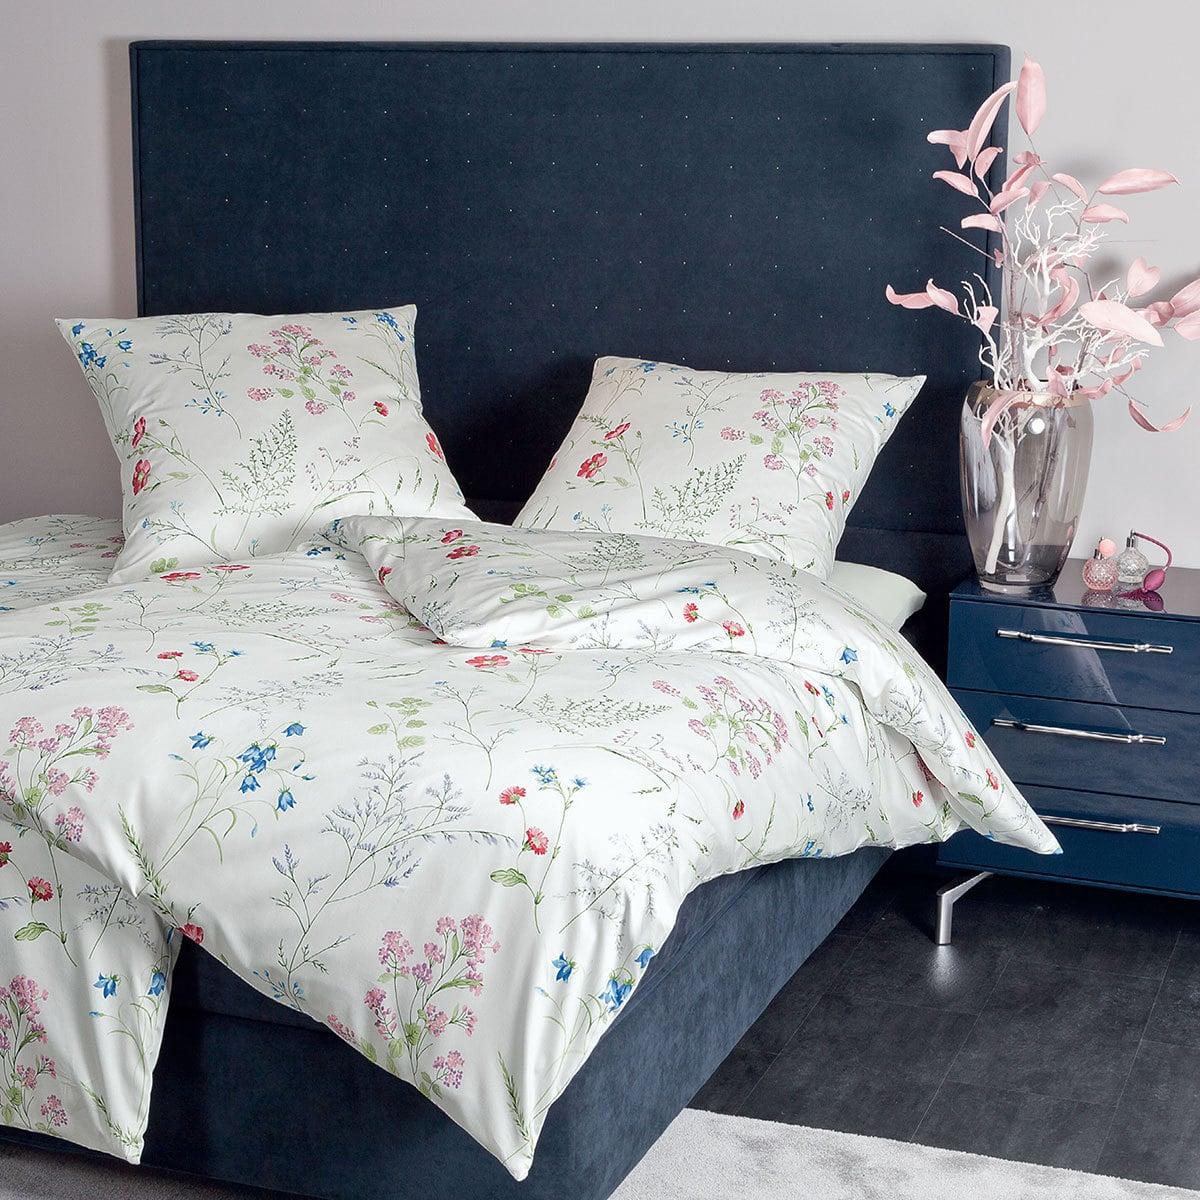 janine mako satin bettw sche messina 43023 01 g nstig online kaufen bei bettwaren shop. Black Bedroom Furniture Sets. Home Design Ideas